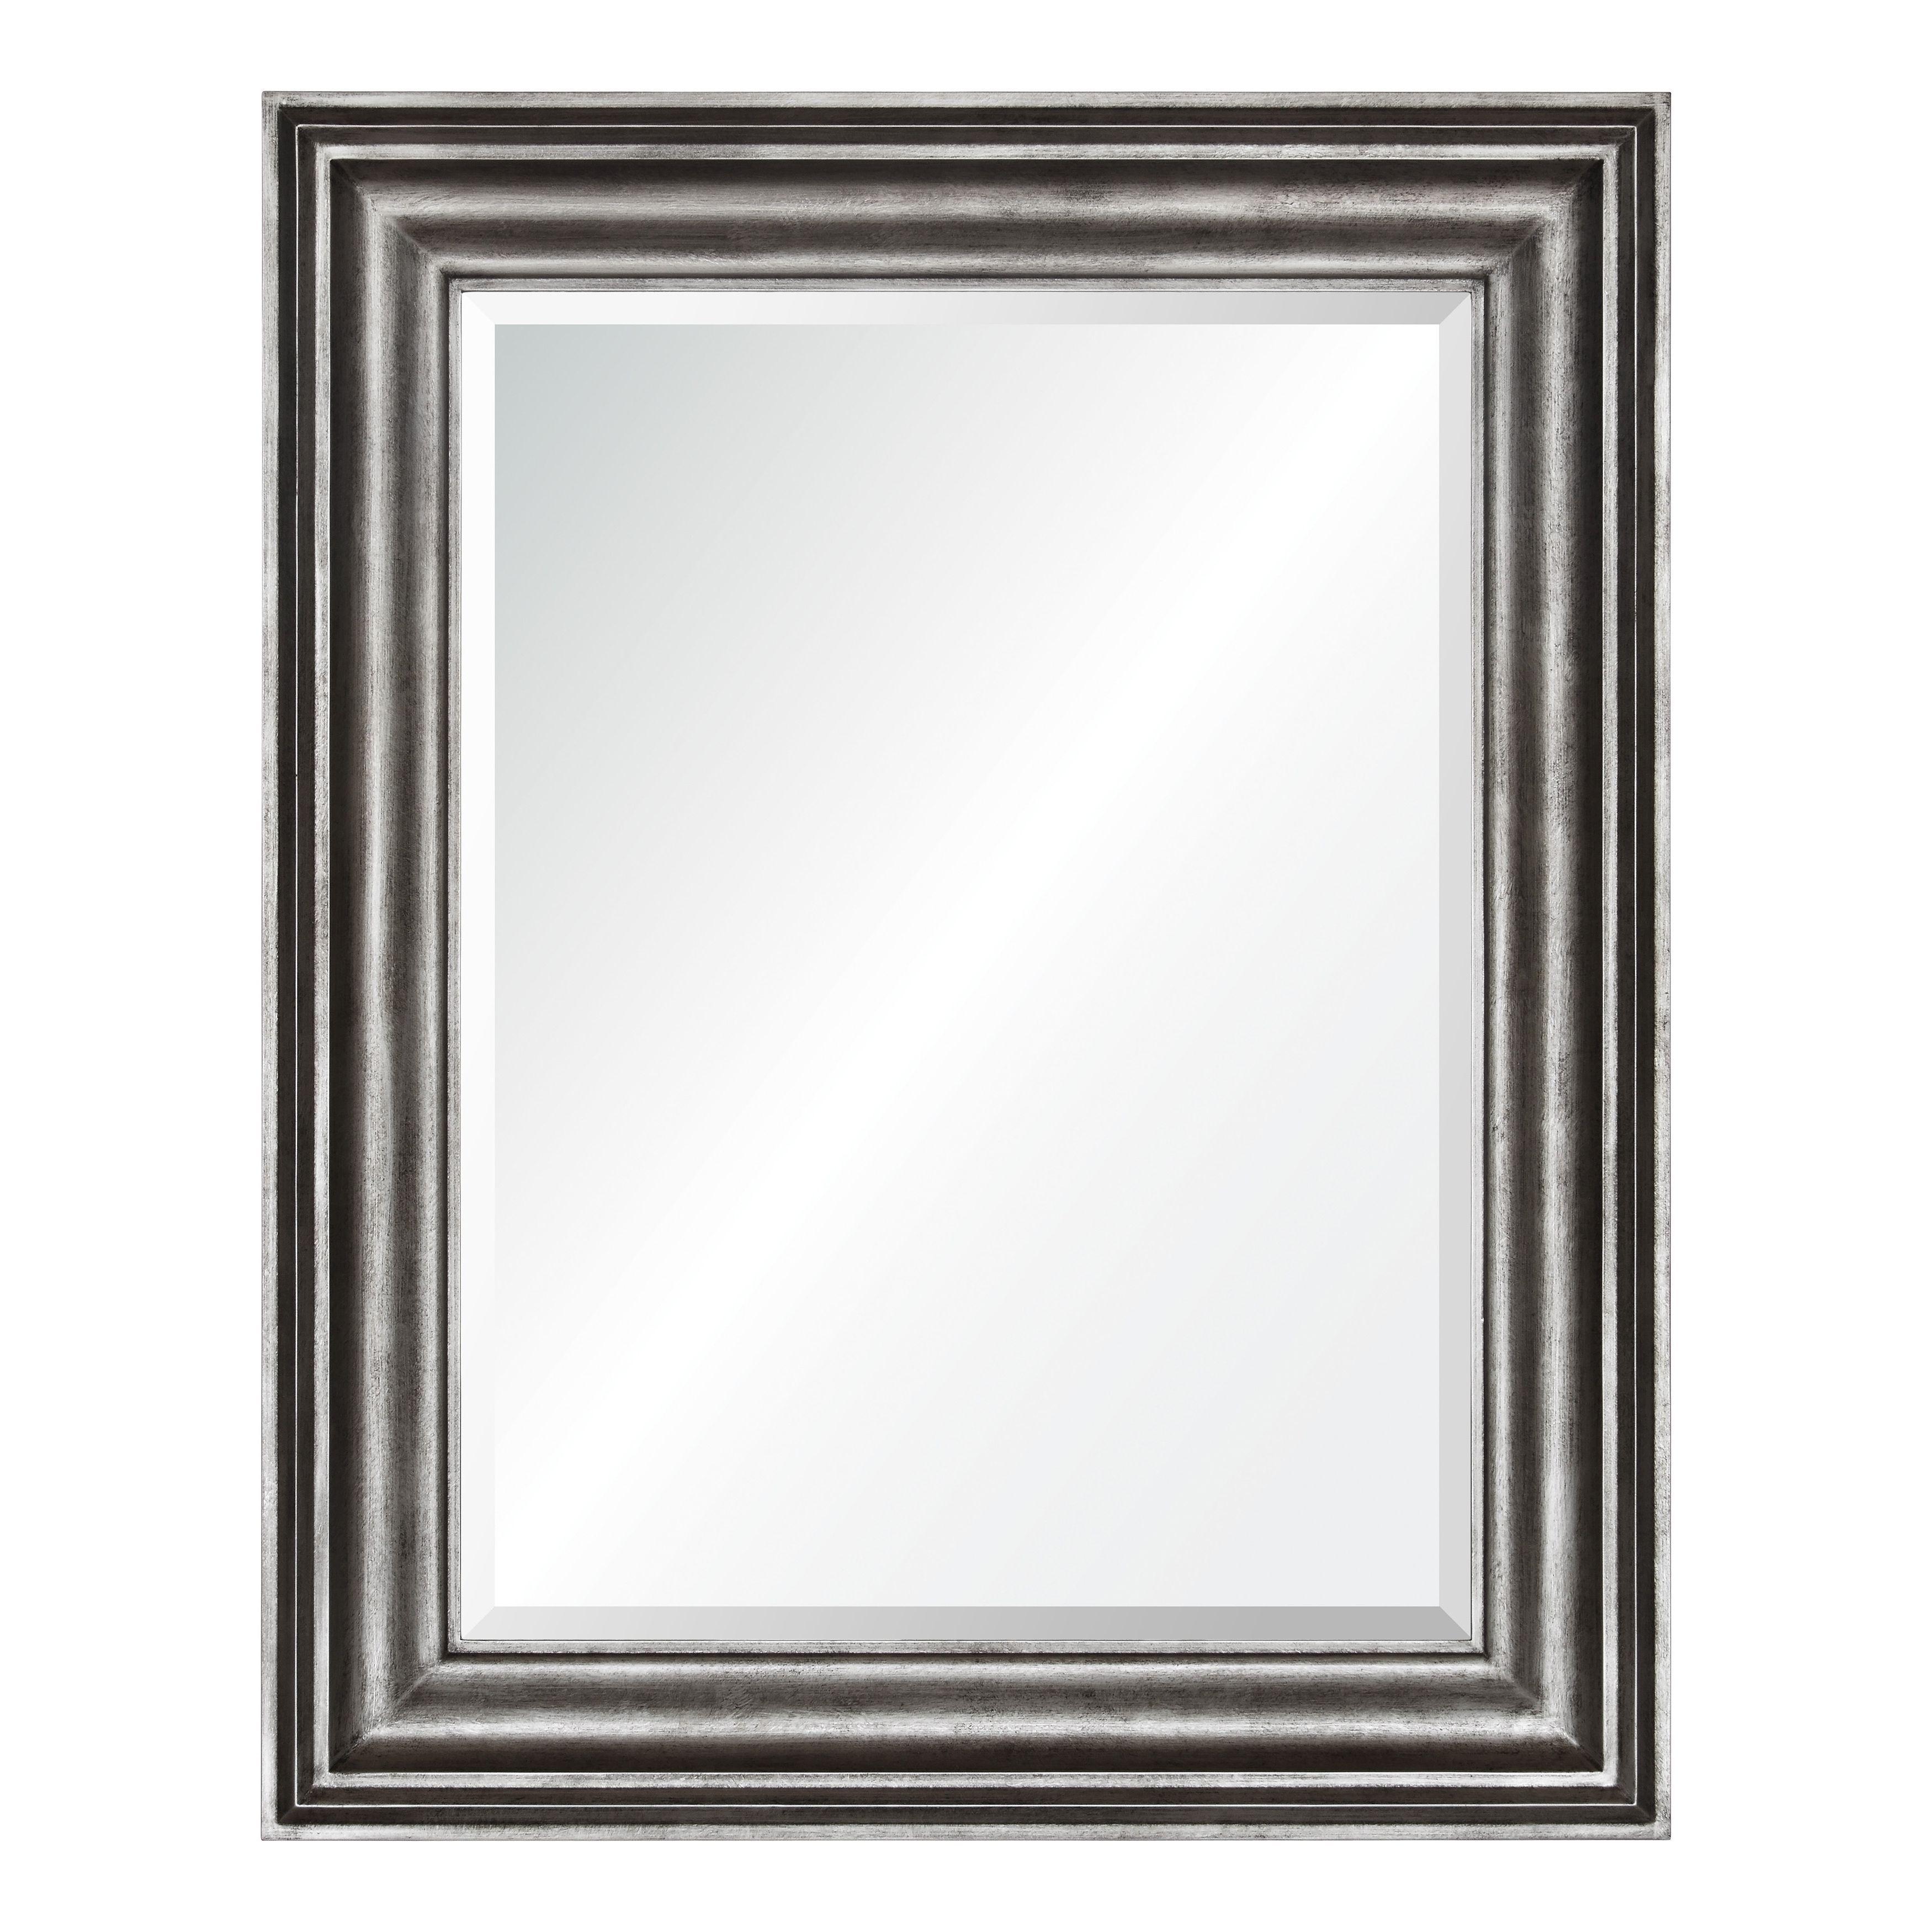 Renwil Ren Wil Vanderbilt Framed Rectangular Mirror